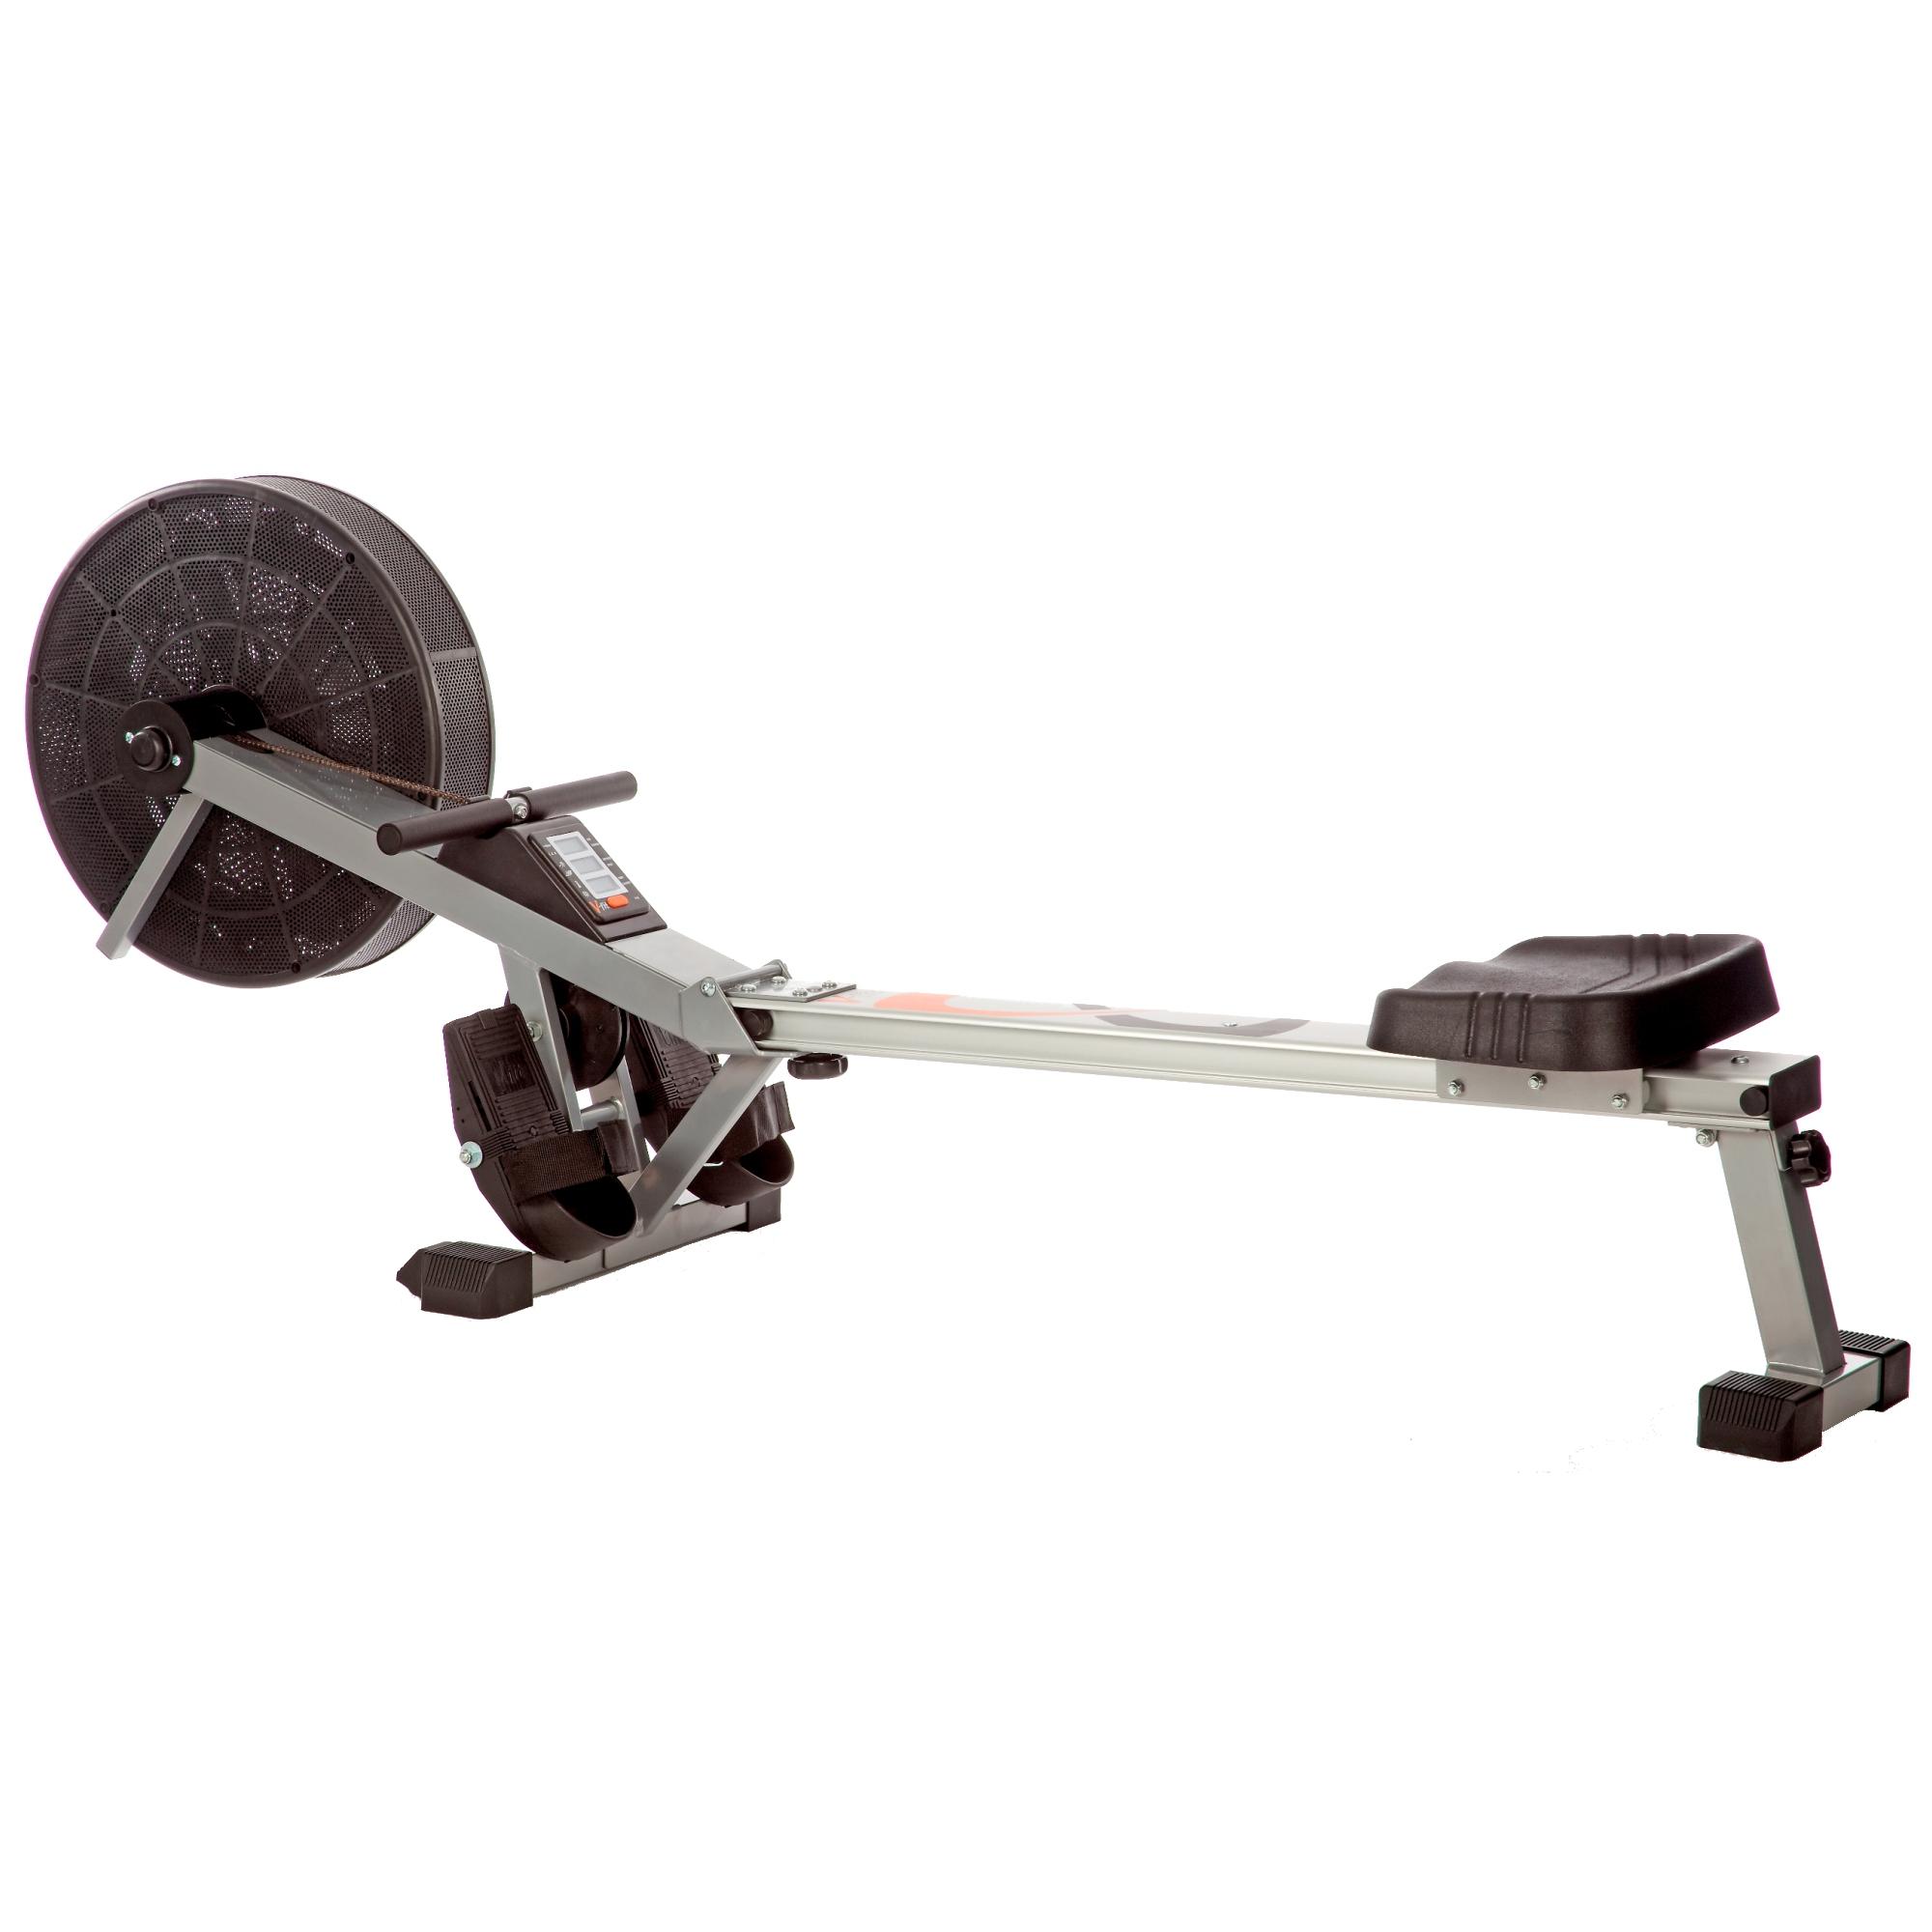 rowing machine distance